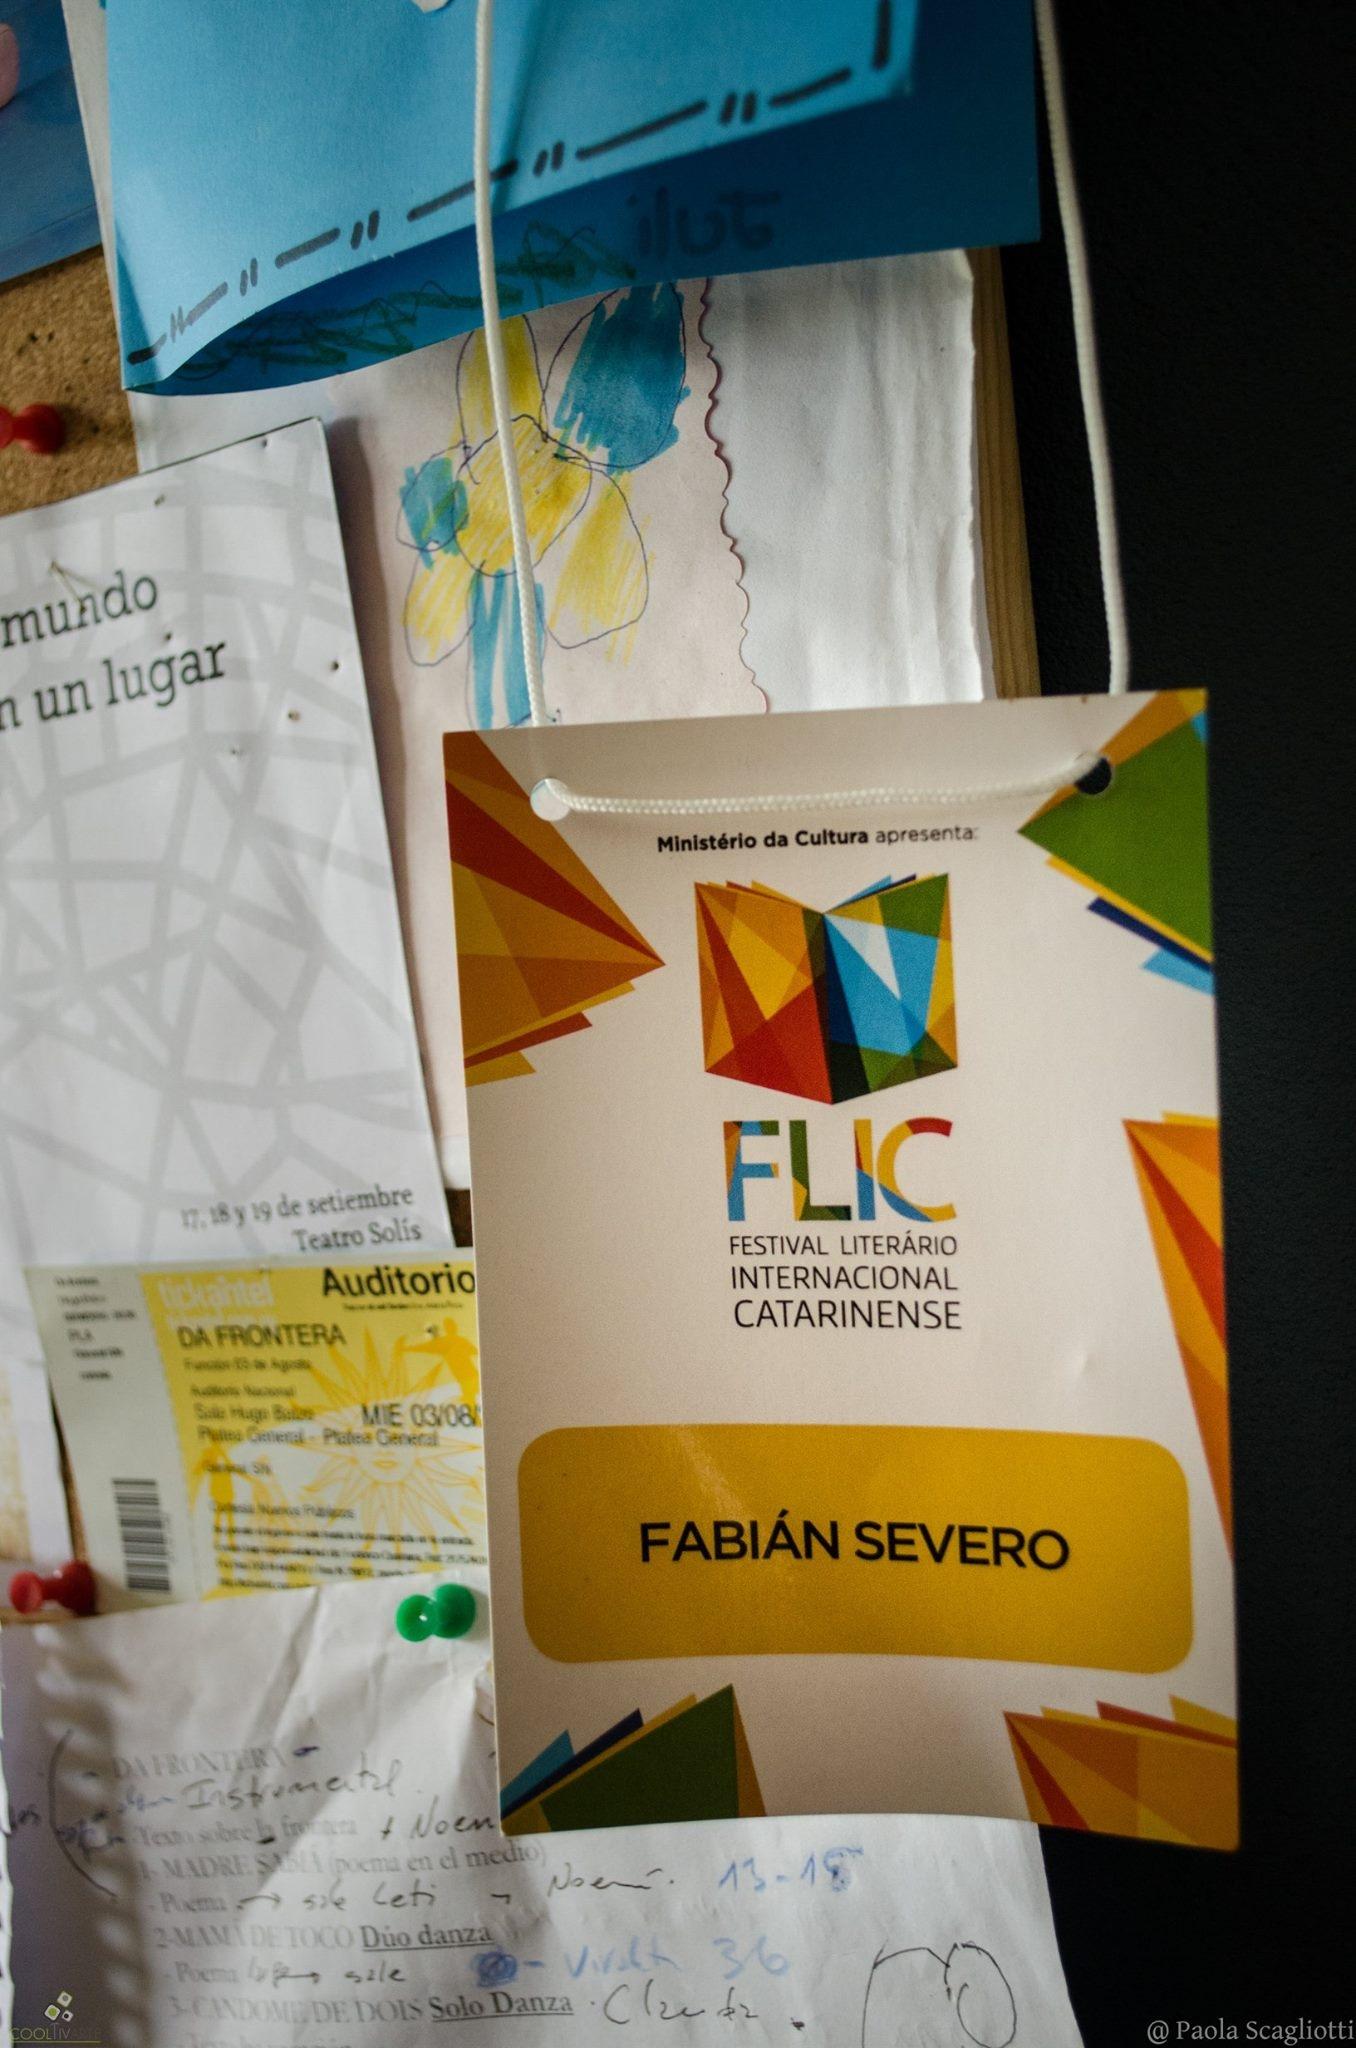 Fotorreportaje a Fabián Severo - Enero 2018 - Foto Paola Scagliotti www cooltivarte com_1598085506905023